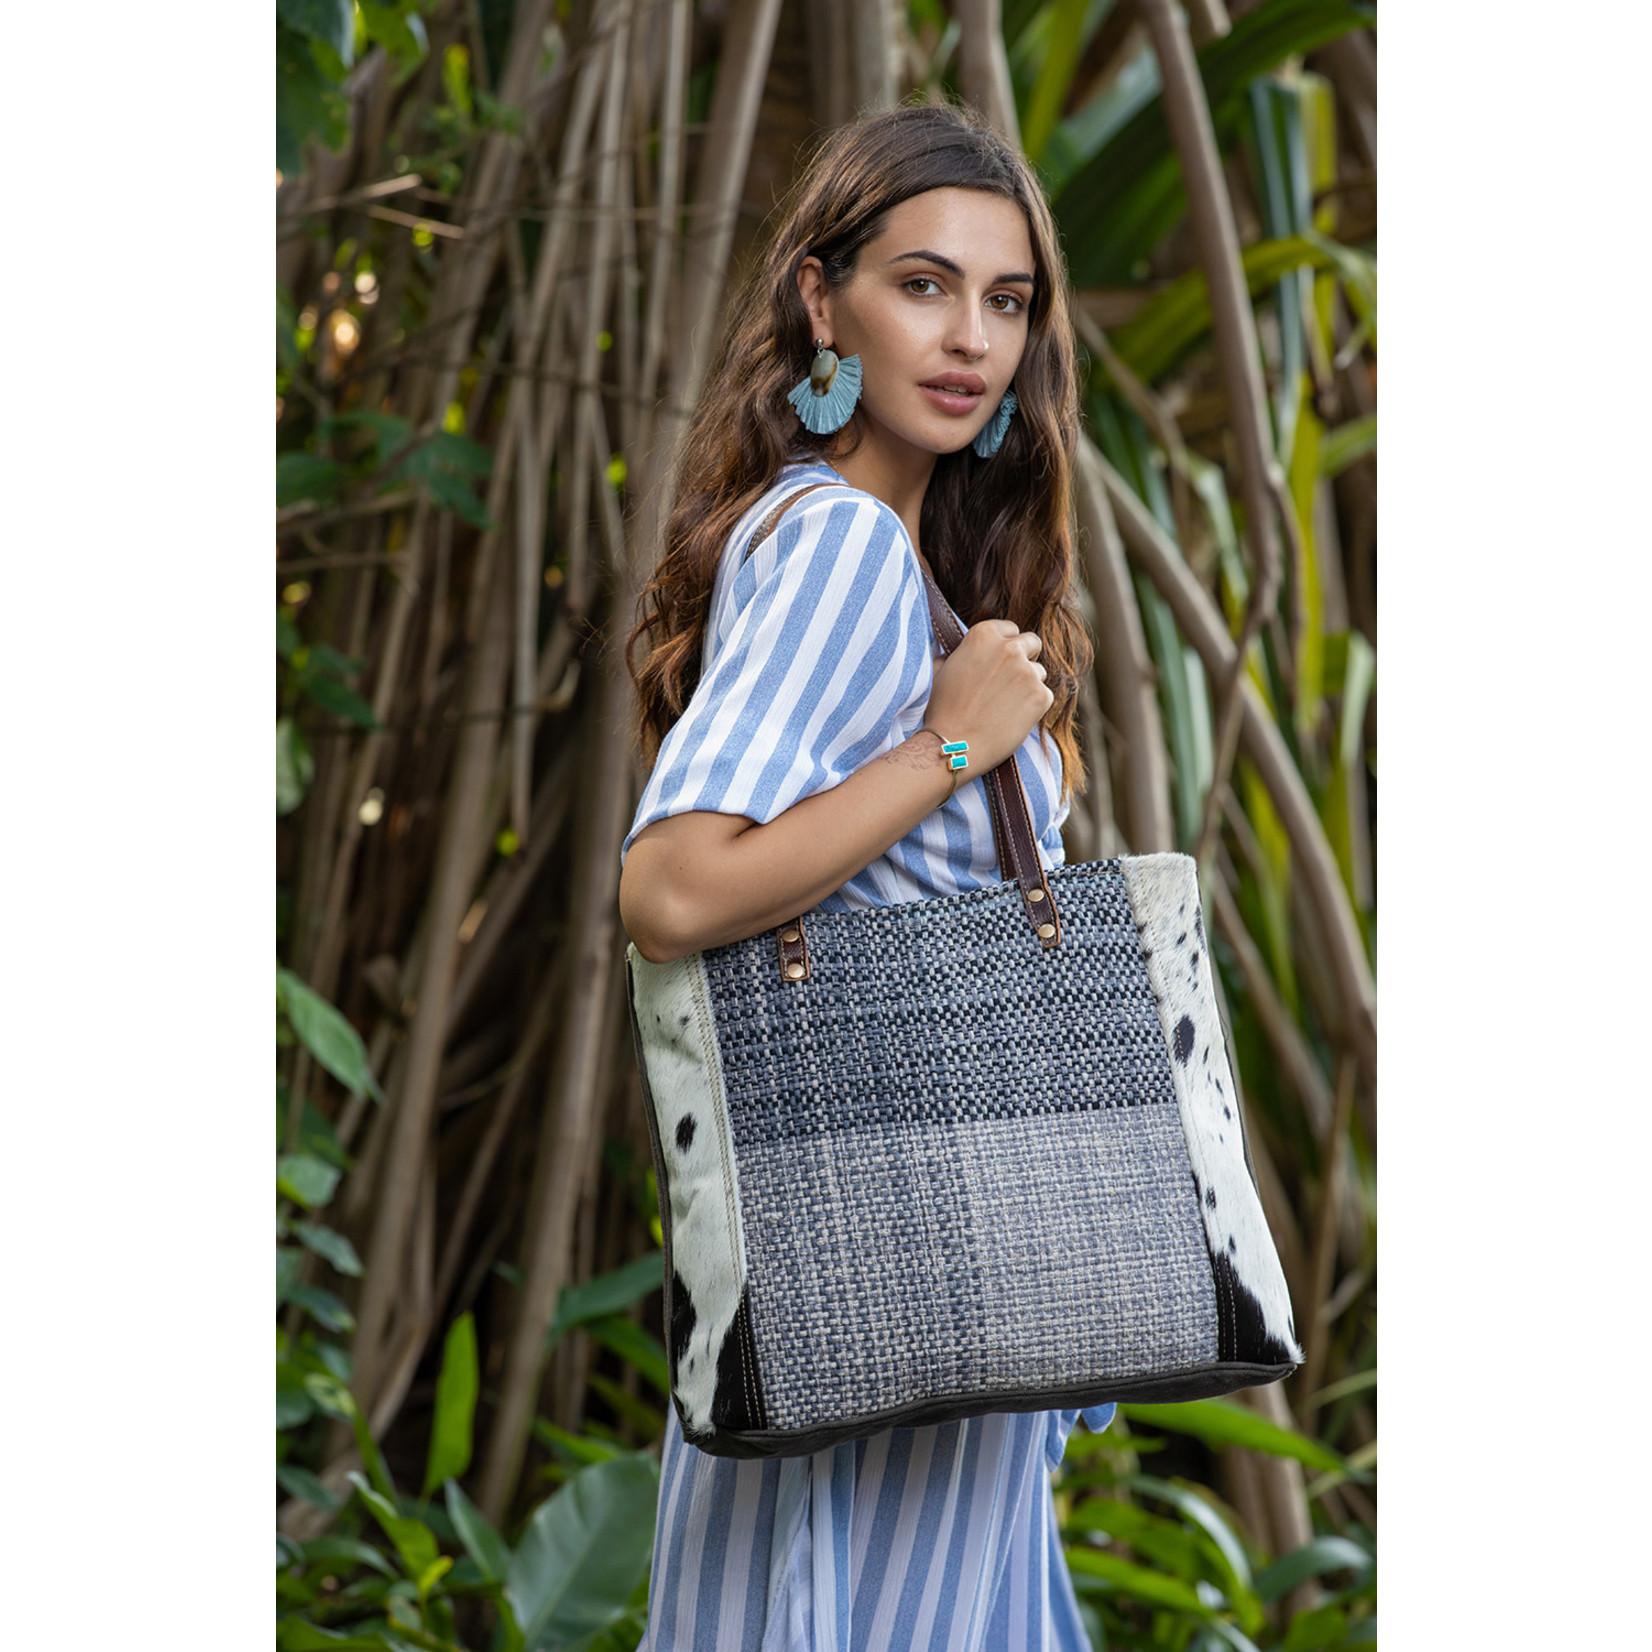 Myra Bags S-2055 Ruffy Tuffy Tote Bag